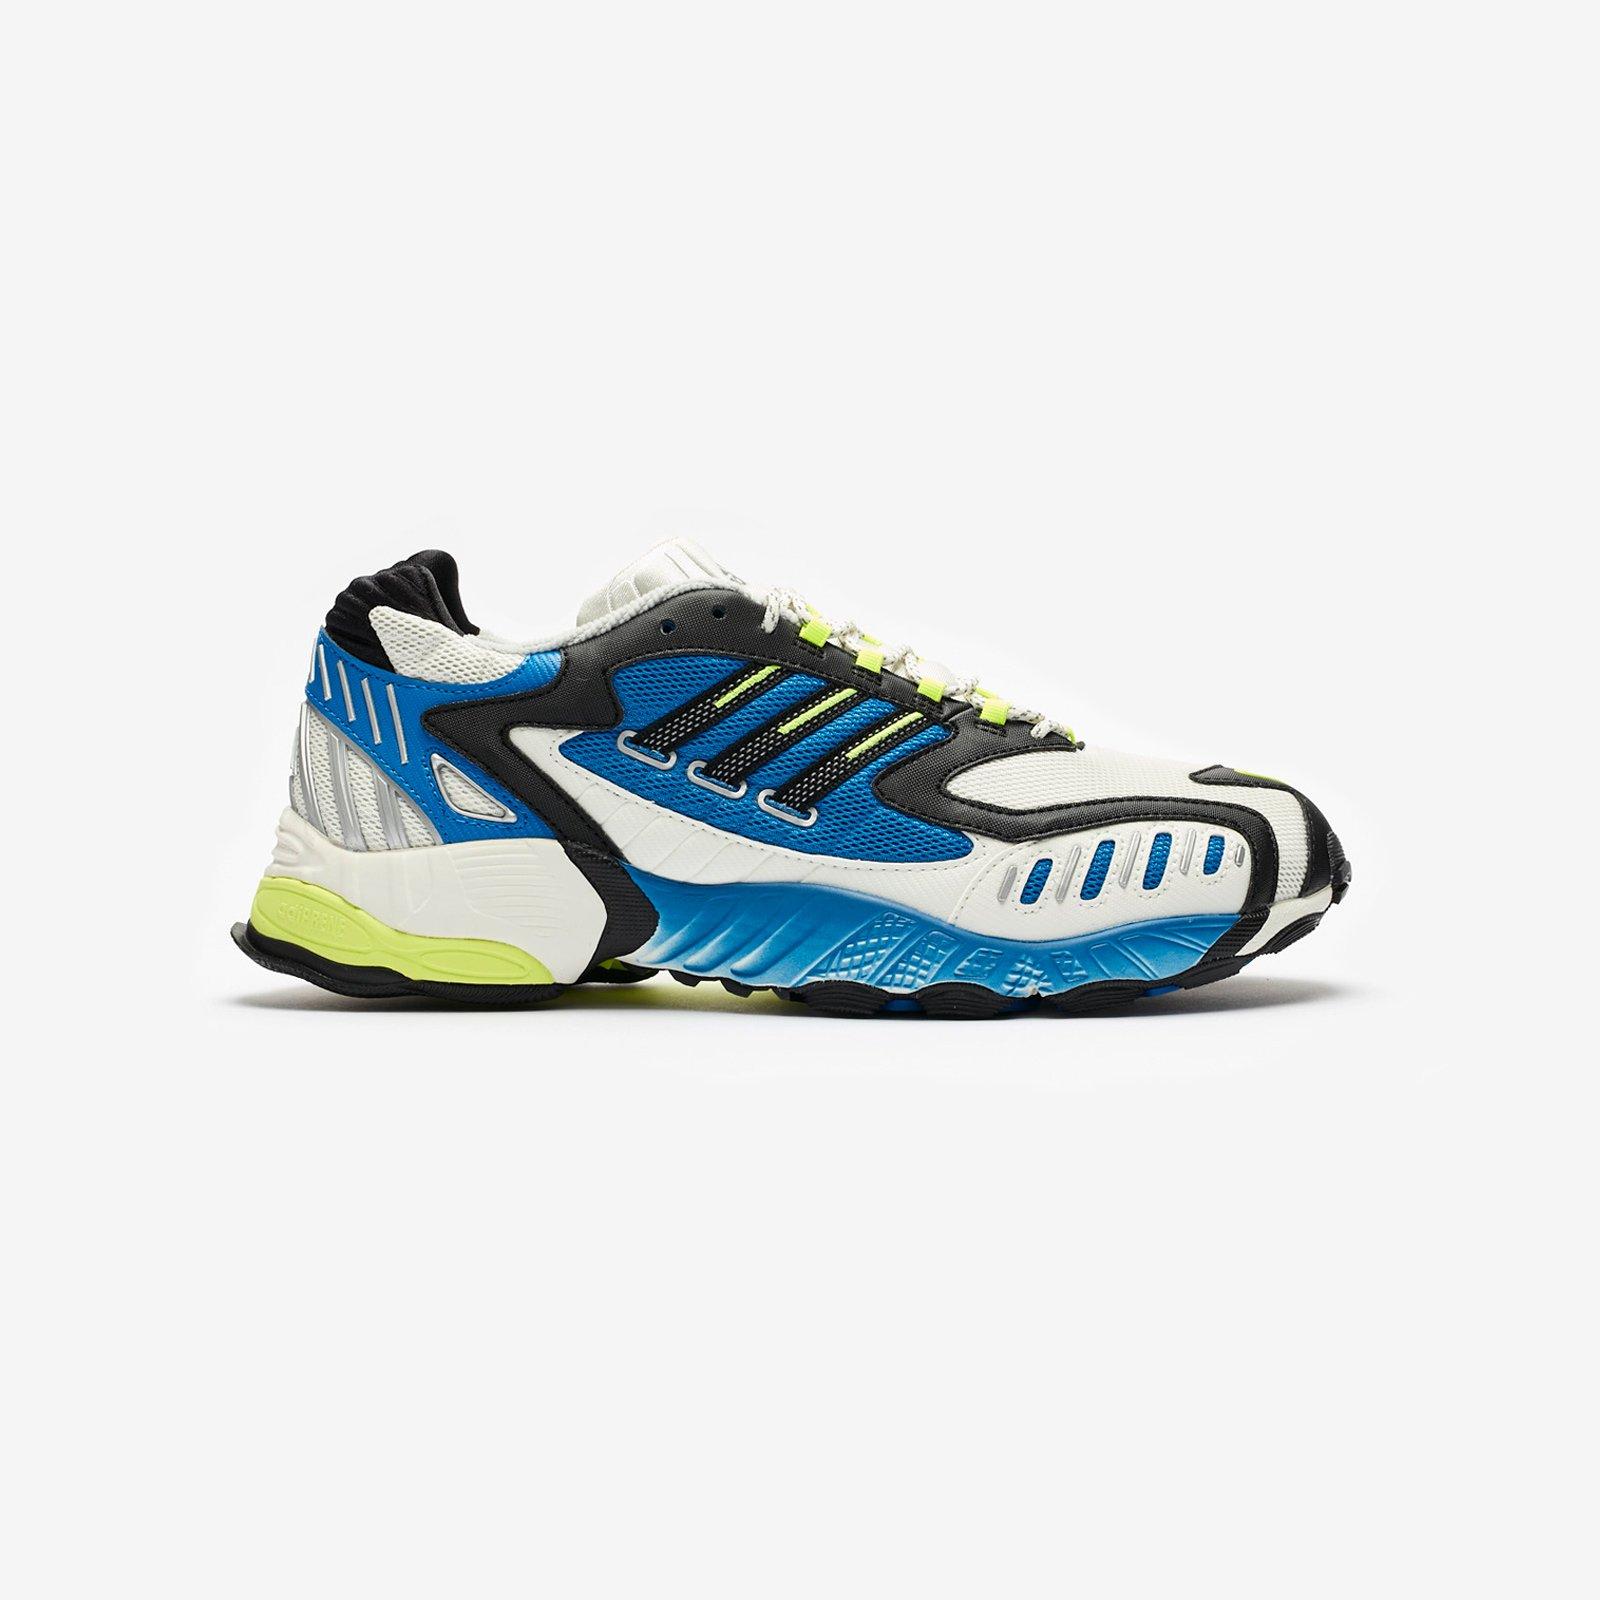 adidas Torsion TRDC Ee7999 Sneakersnstuff | sneakers